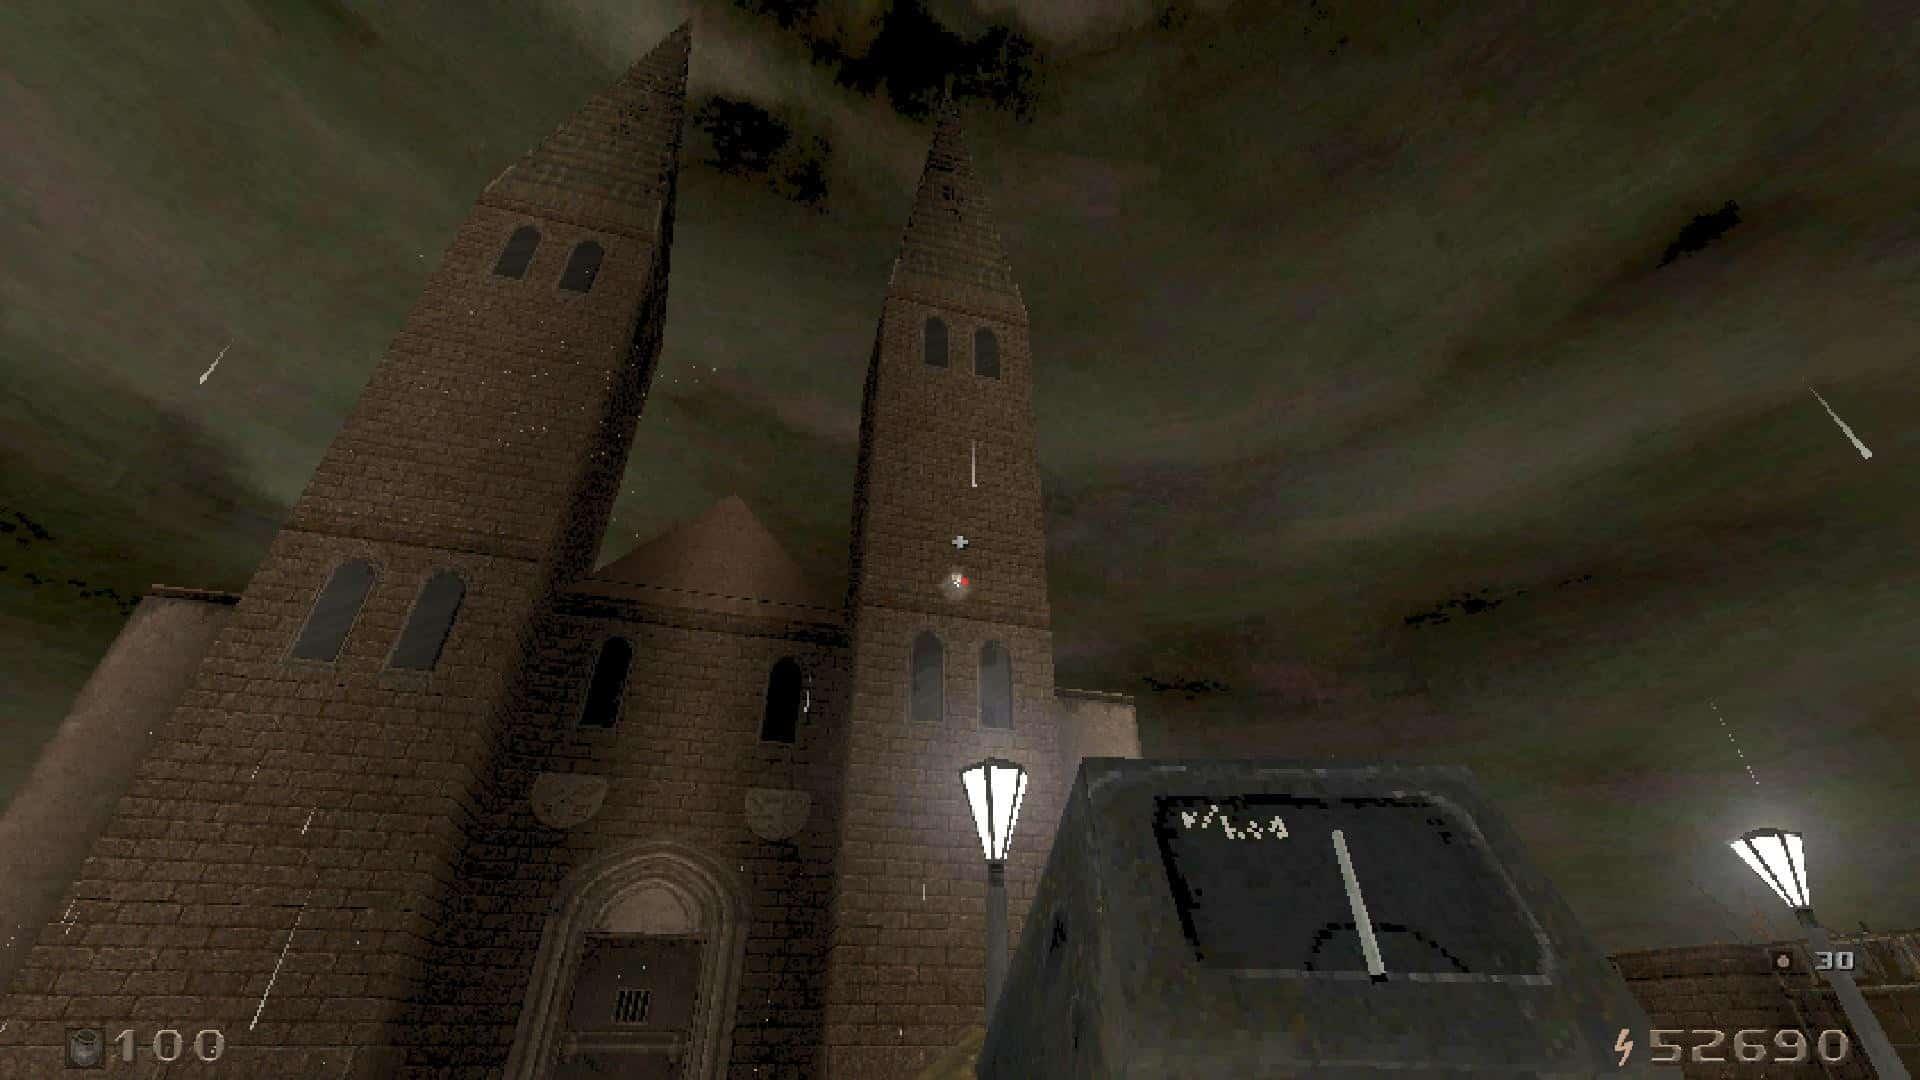 HROT retro FPS Spytihněv Czechoslovakia first-person shooter like Quake, Half-Life, Metro 2033